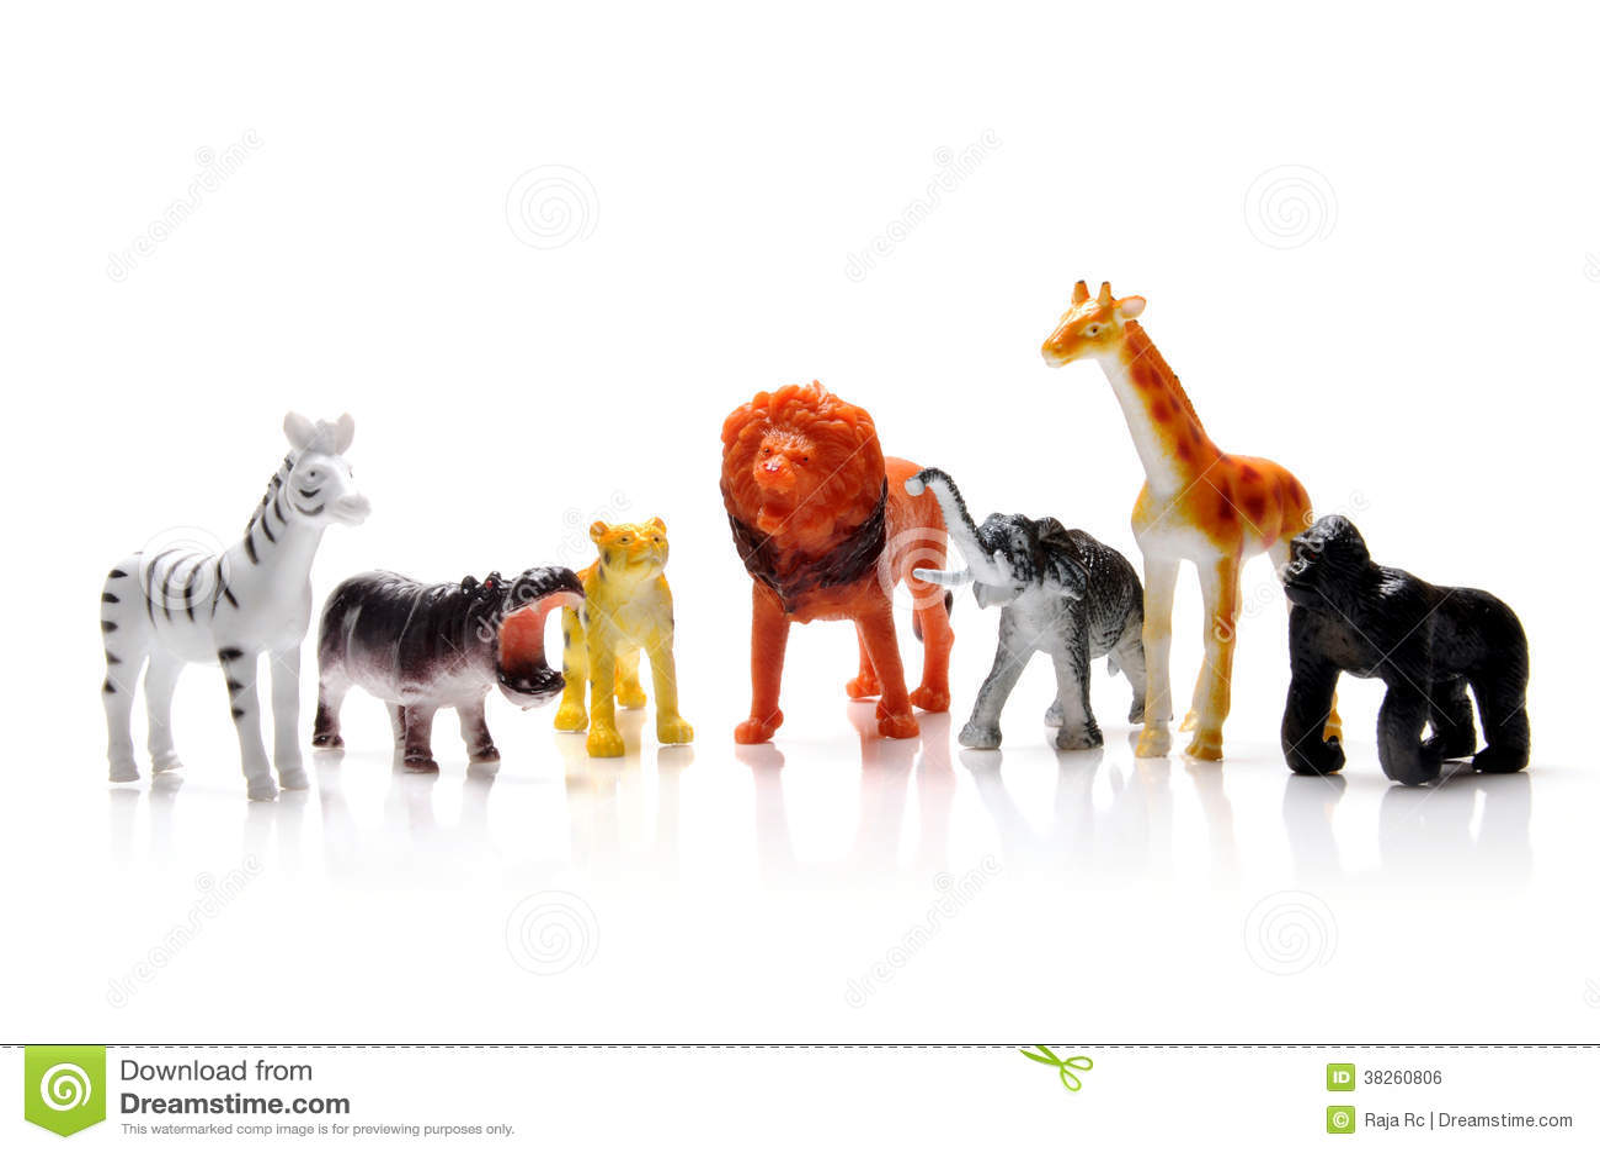 Toy Animals Stock Photo Image Of Isolated Male Dangerous 38260806